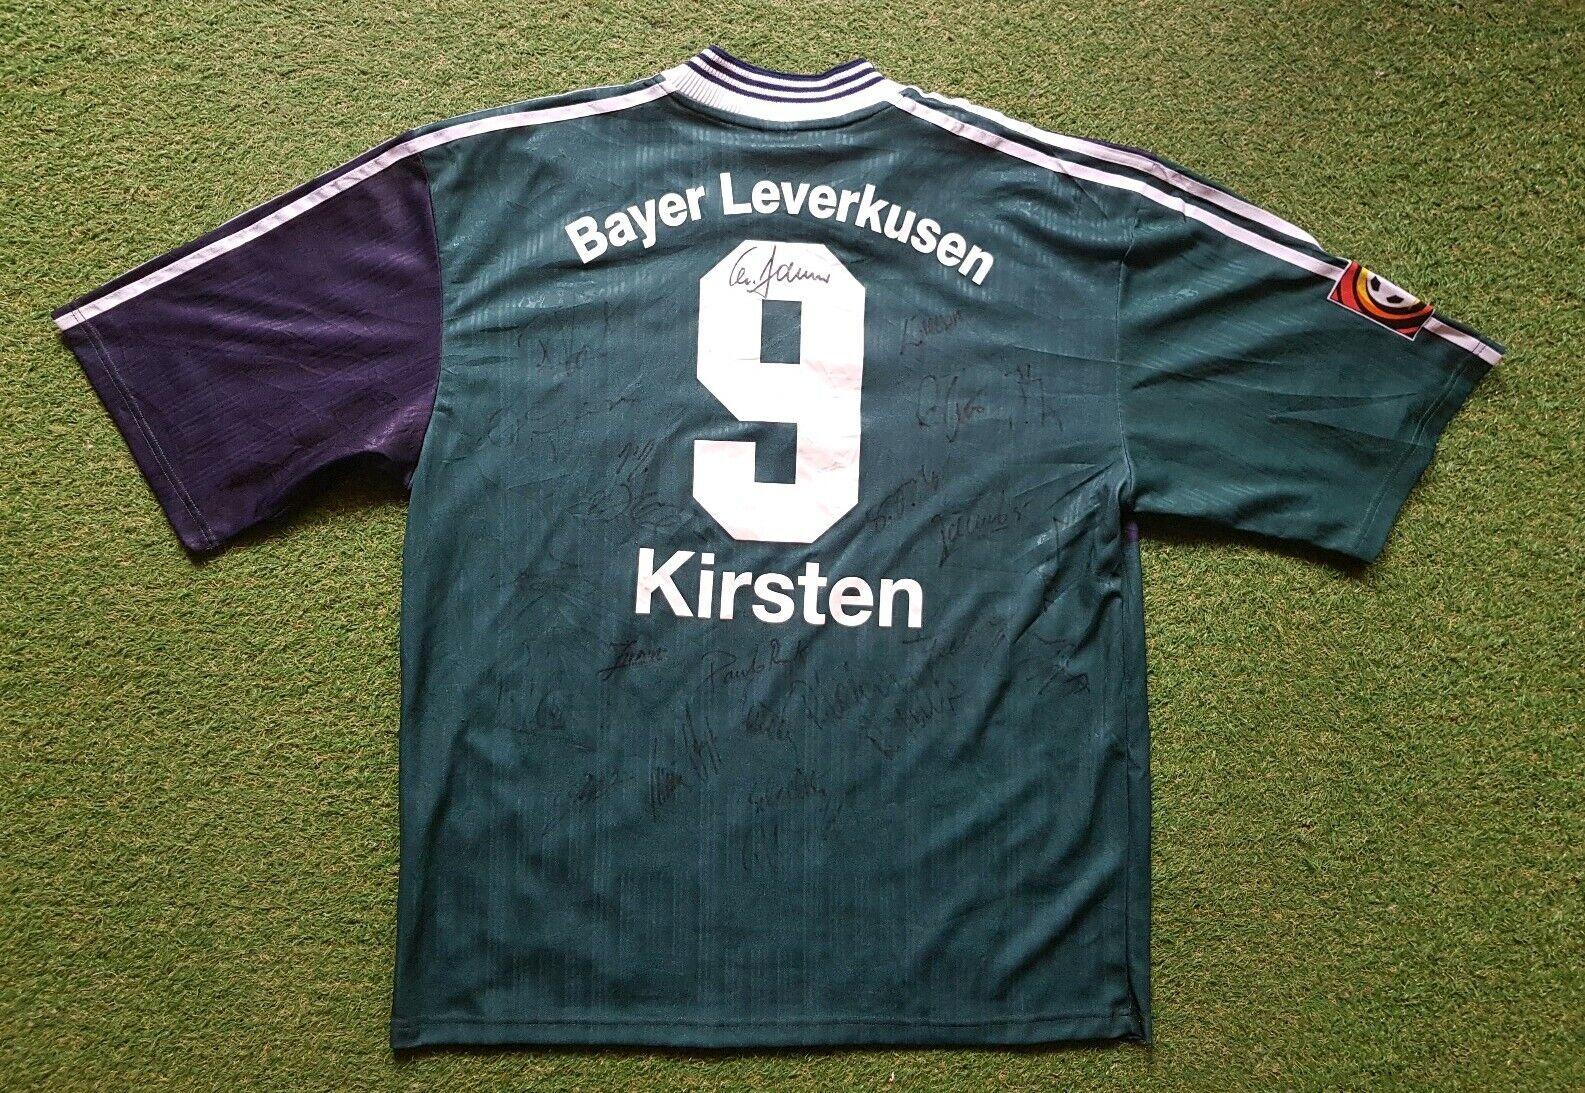 Bayer Leverkusen Maillot XL 1996 1997 Camiseta Adidas Aspirina Kirsten